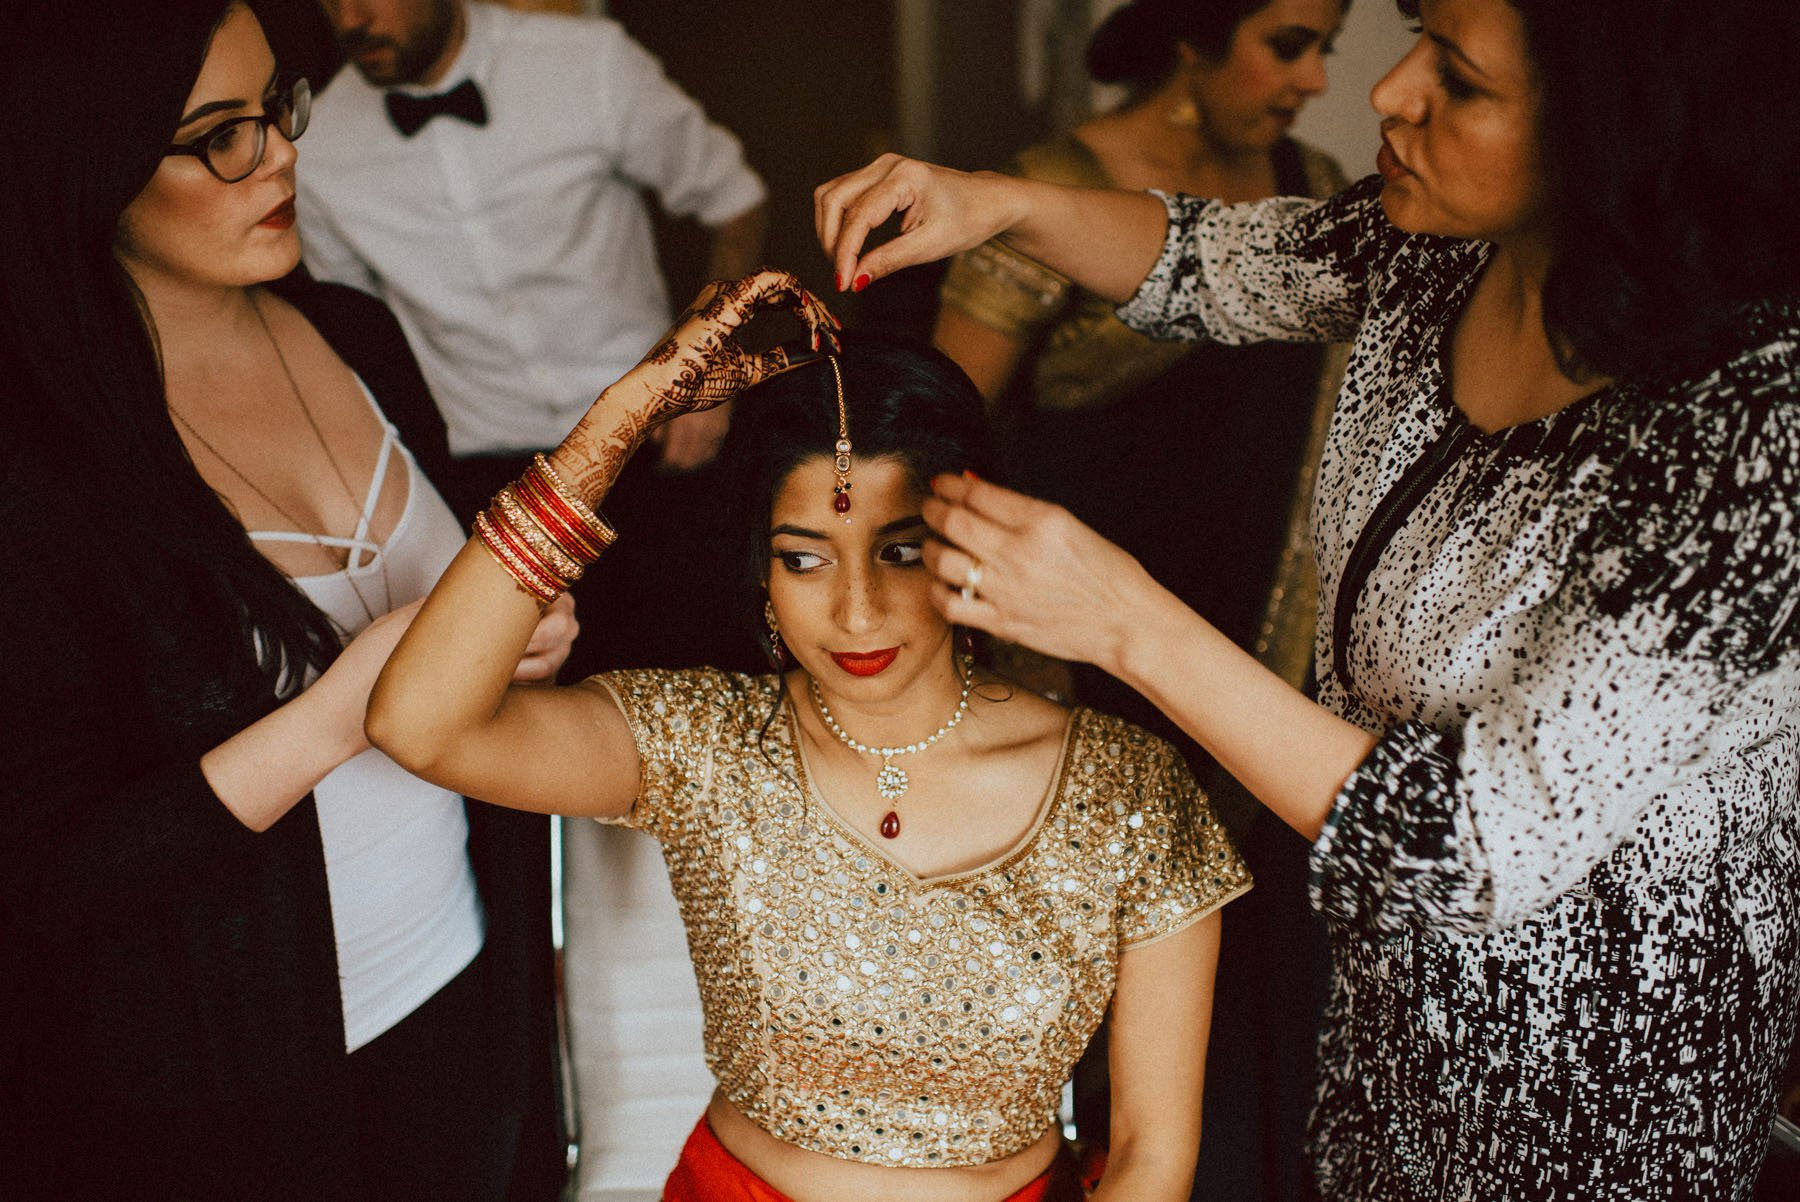 vie-philadelphia-indian-wedding-17.jpg